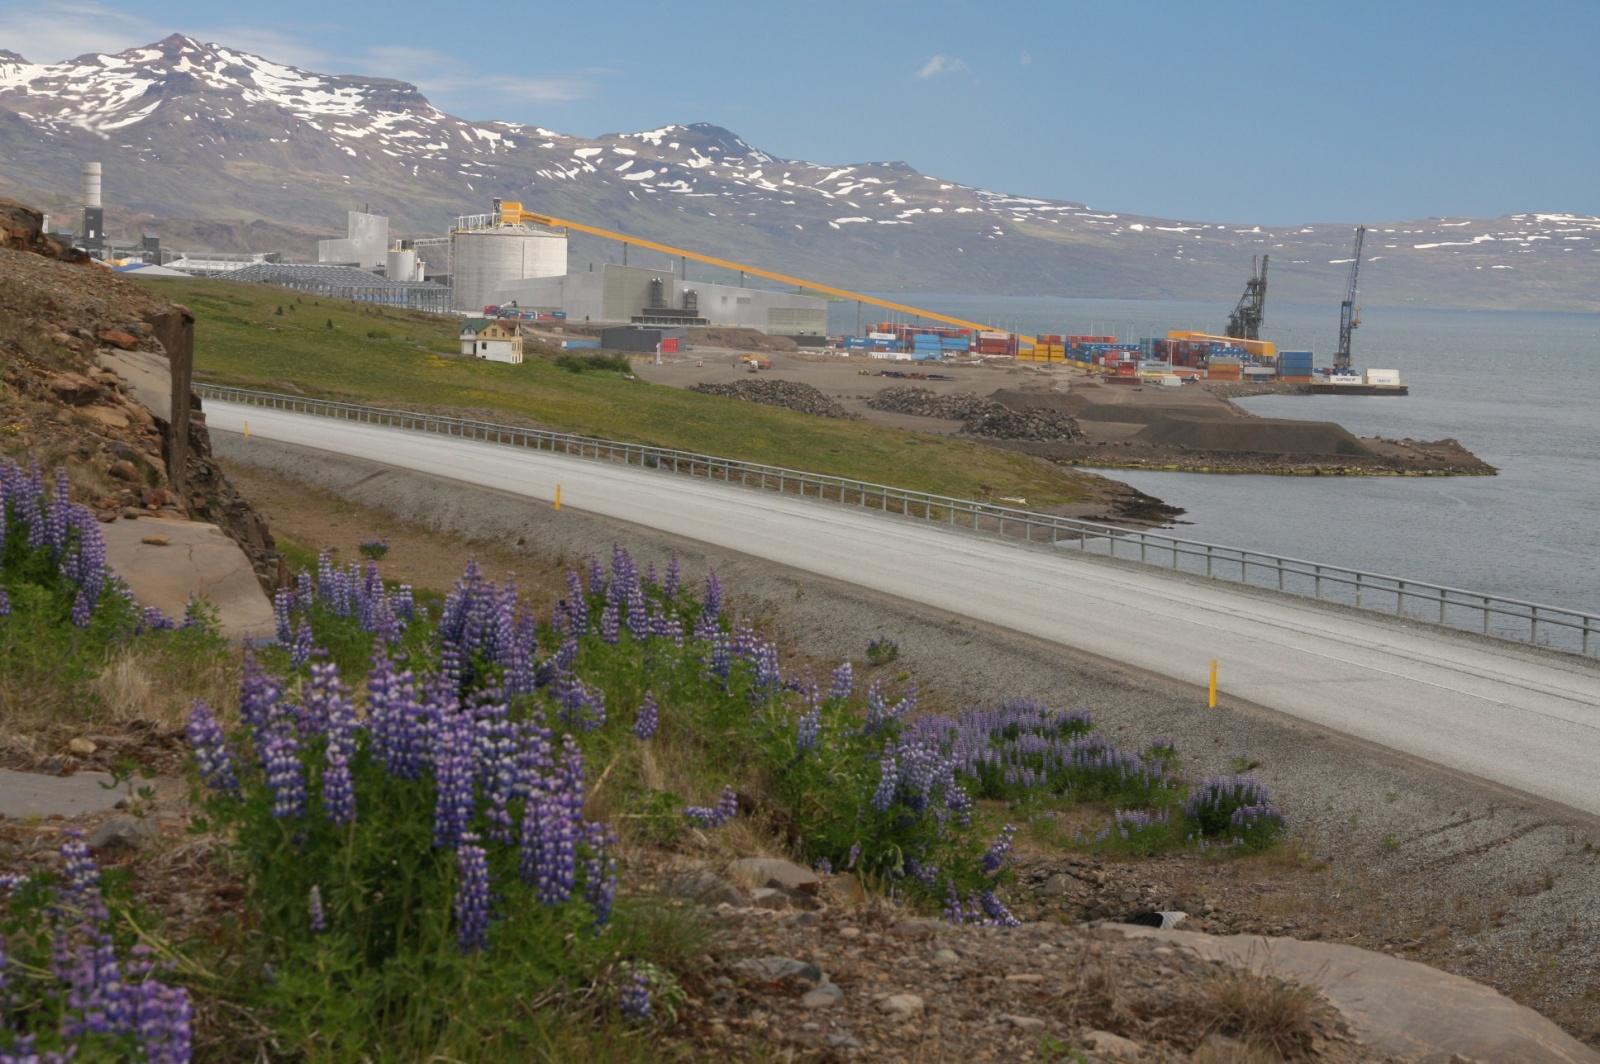 Alcoa Fjarðaál - the controversial aluminium smelter at Reydarfjorður